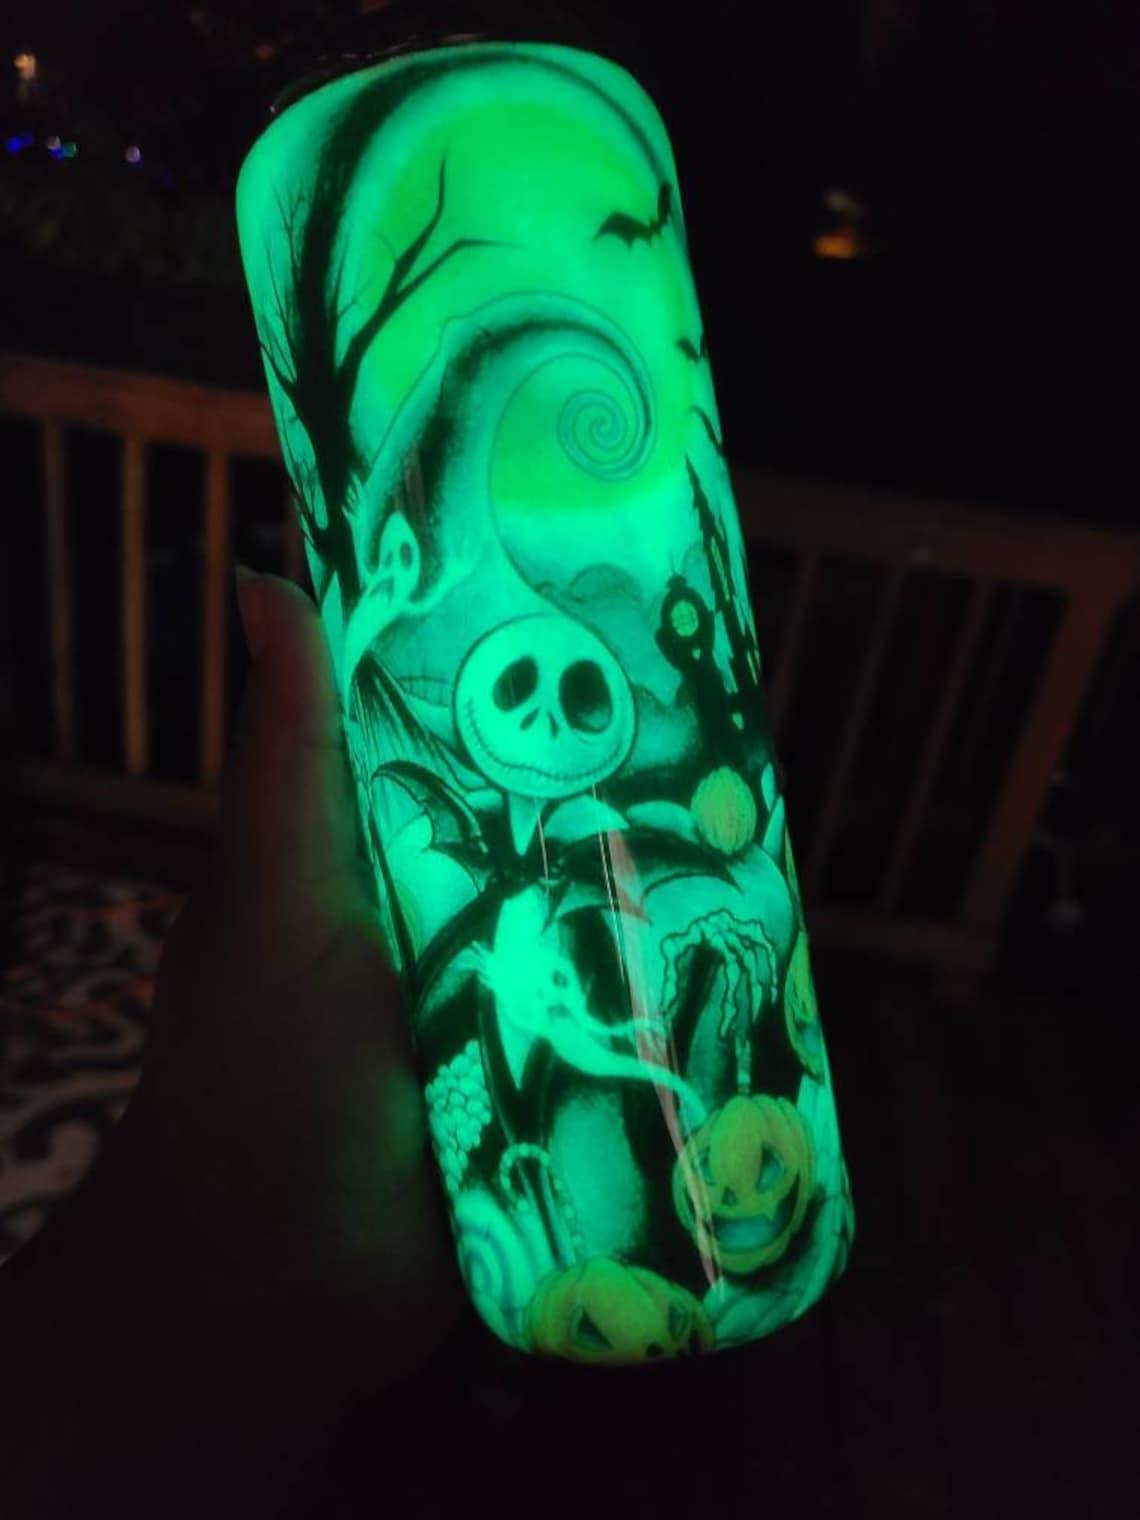 Nightmare Before Christmas Glow In the Dark Tumbler Cup  image 3